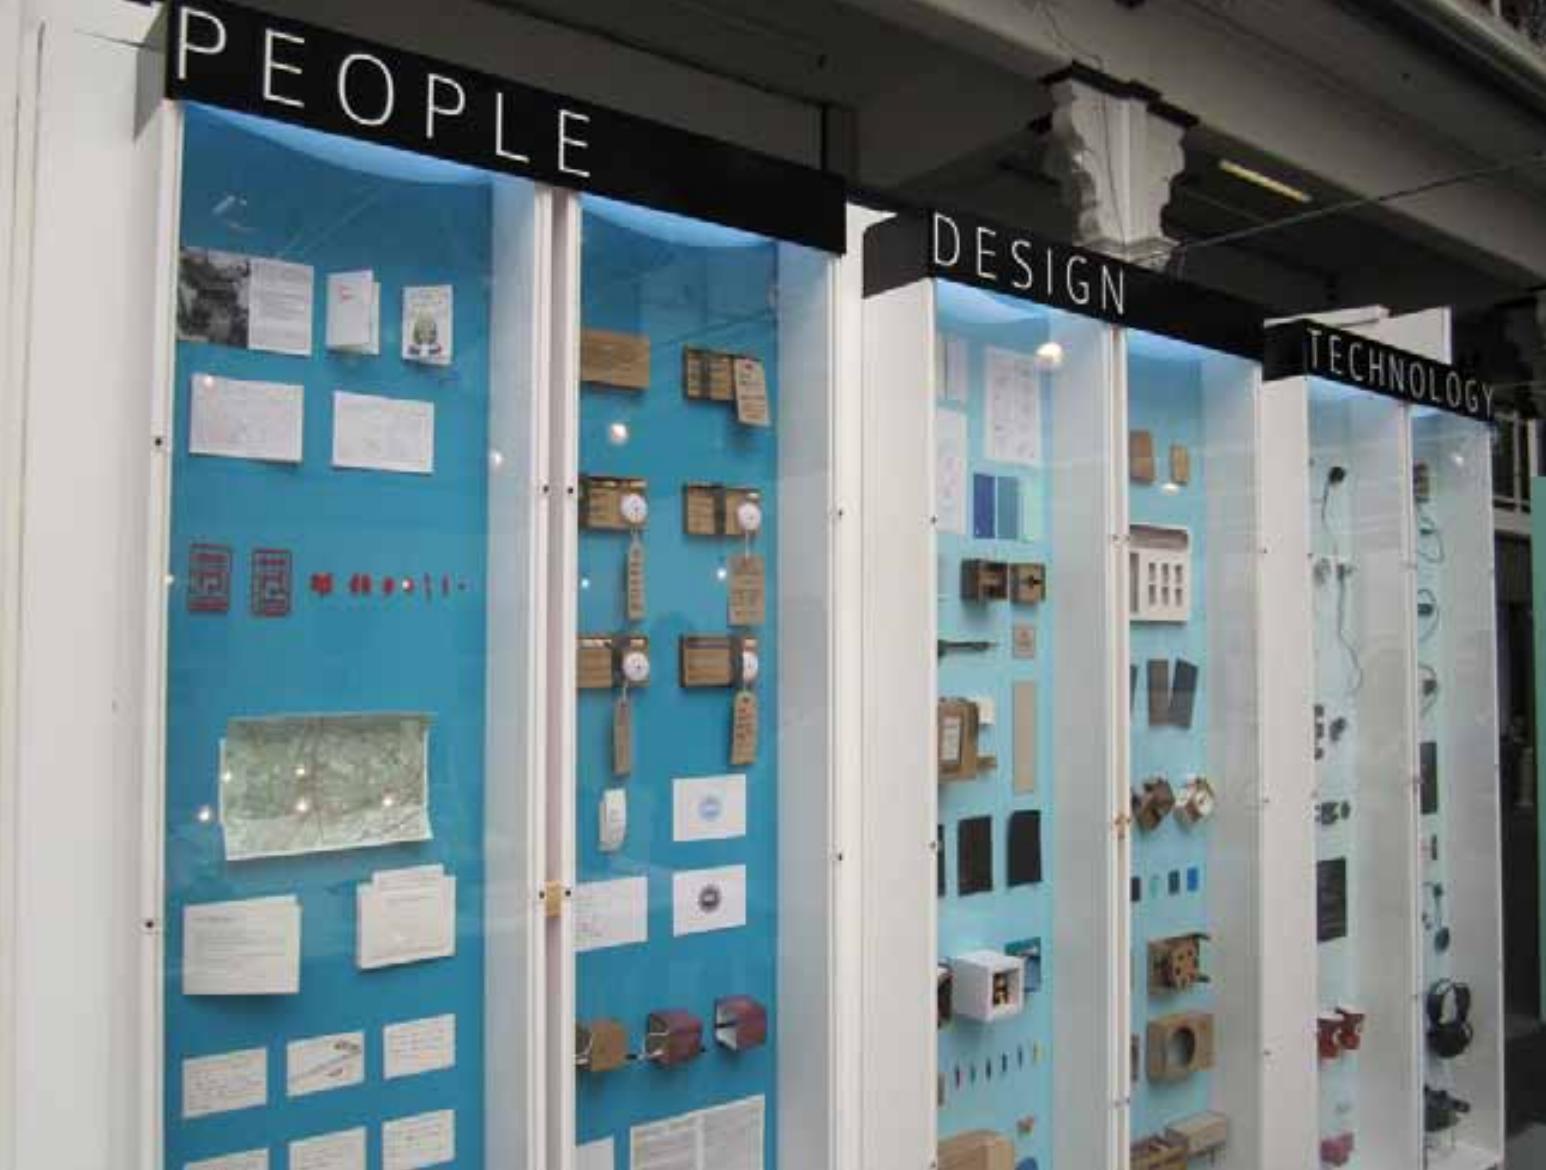 people design technology – Jamesricedesign